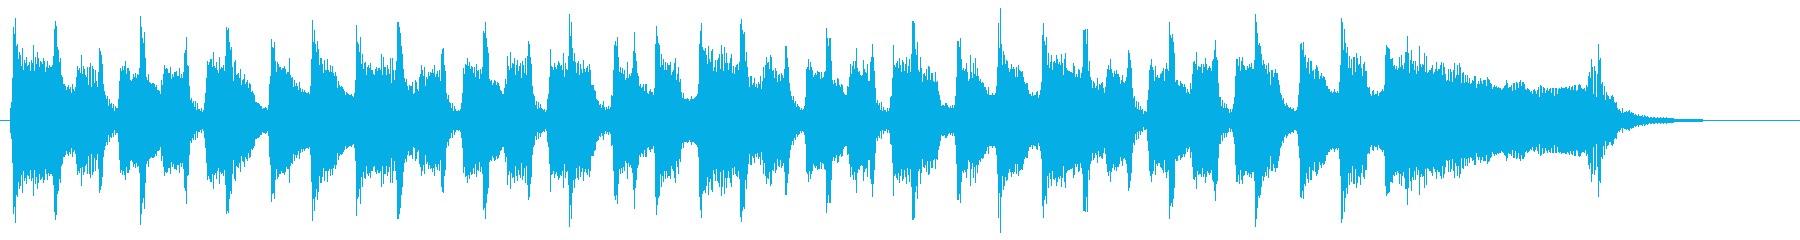 YouTubeの最初のダイジェスト映像にの再生済みの波形